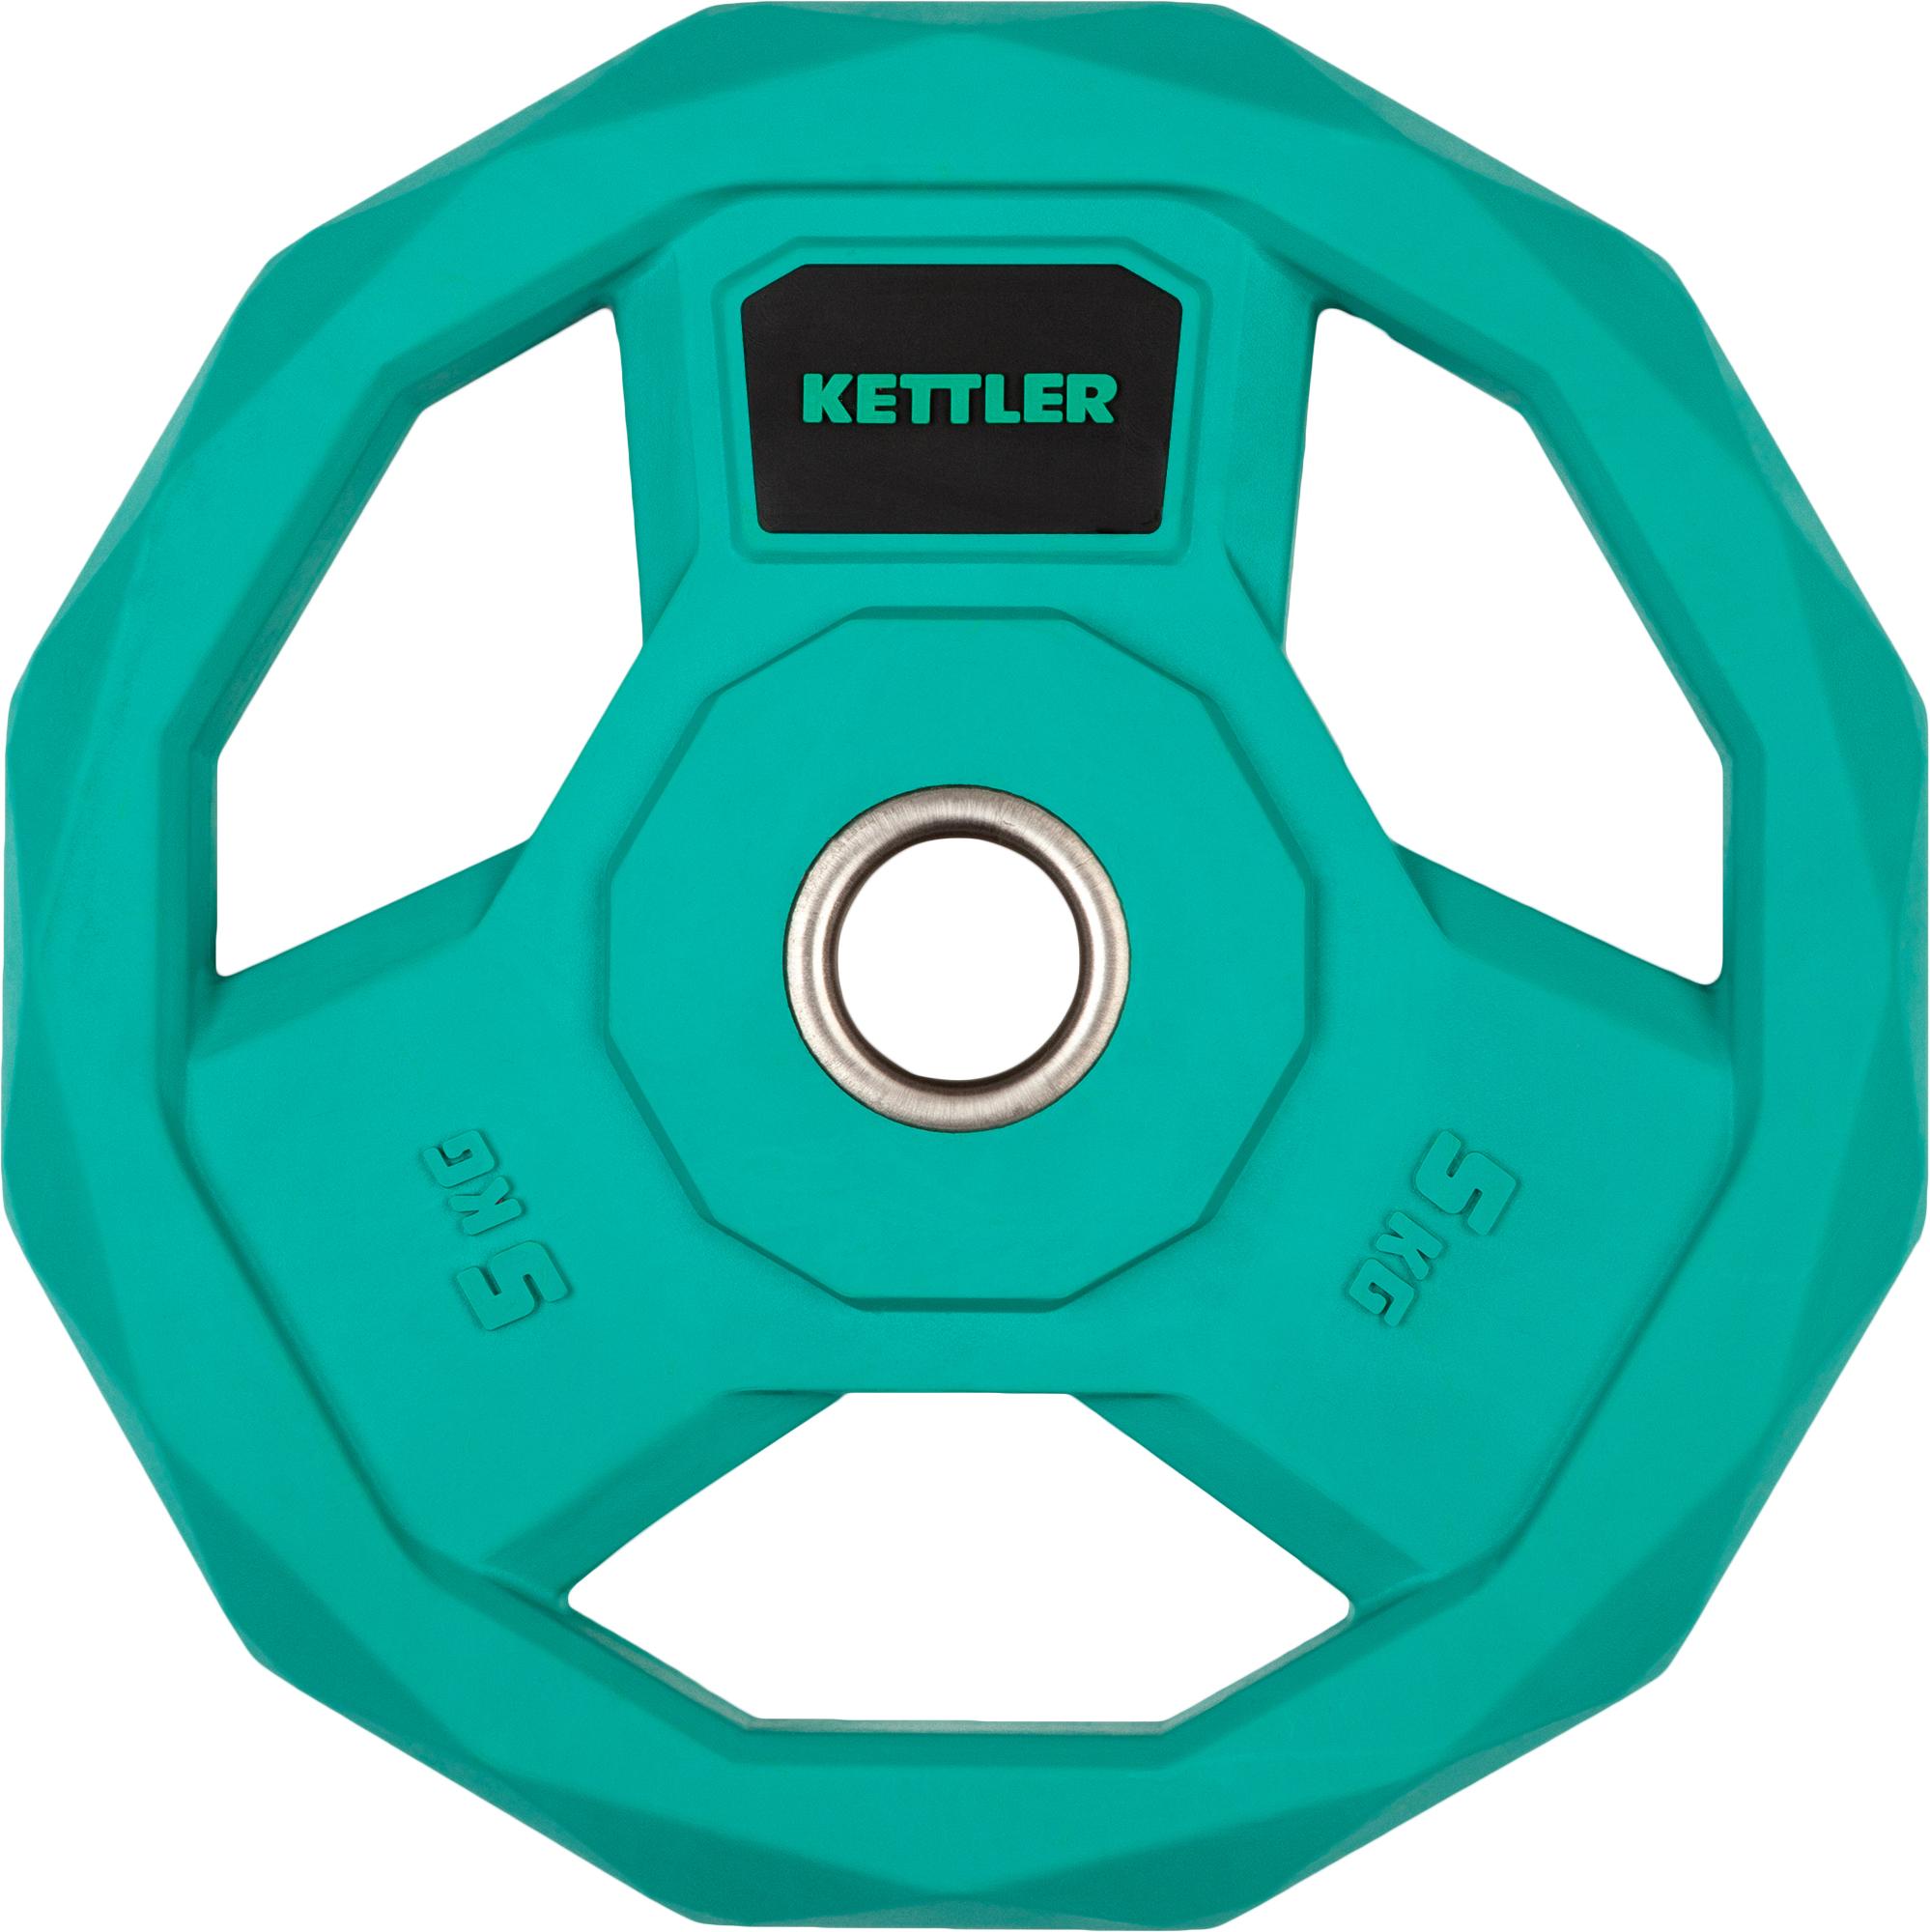 Kettler Блин стальной обрезиненный Kettler 5 кг